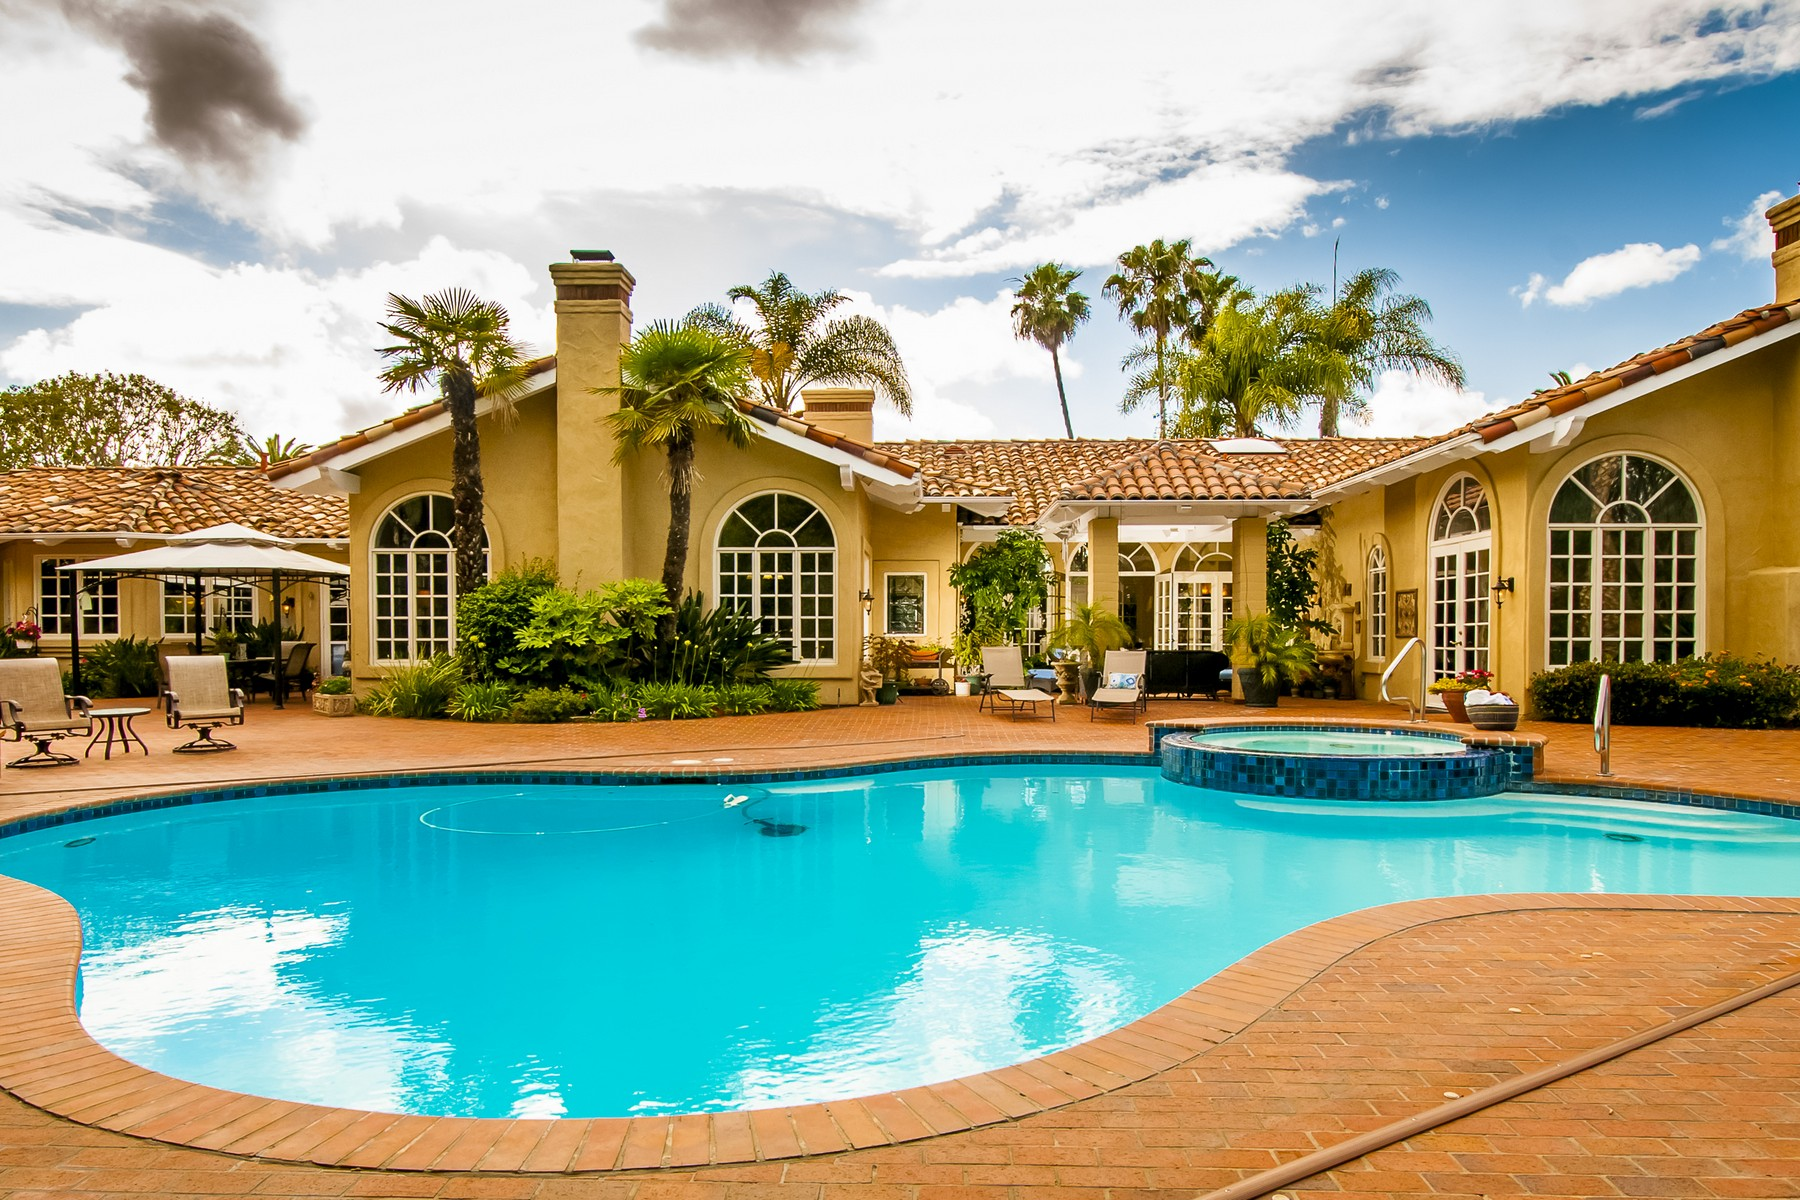 Property For Sale at 17285 Circa Del Sur